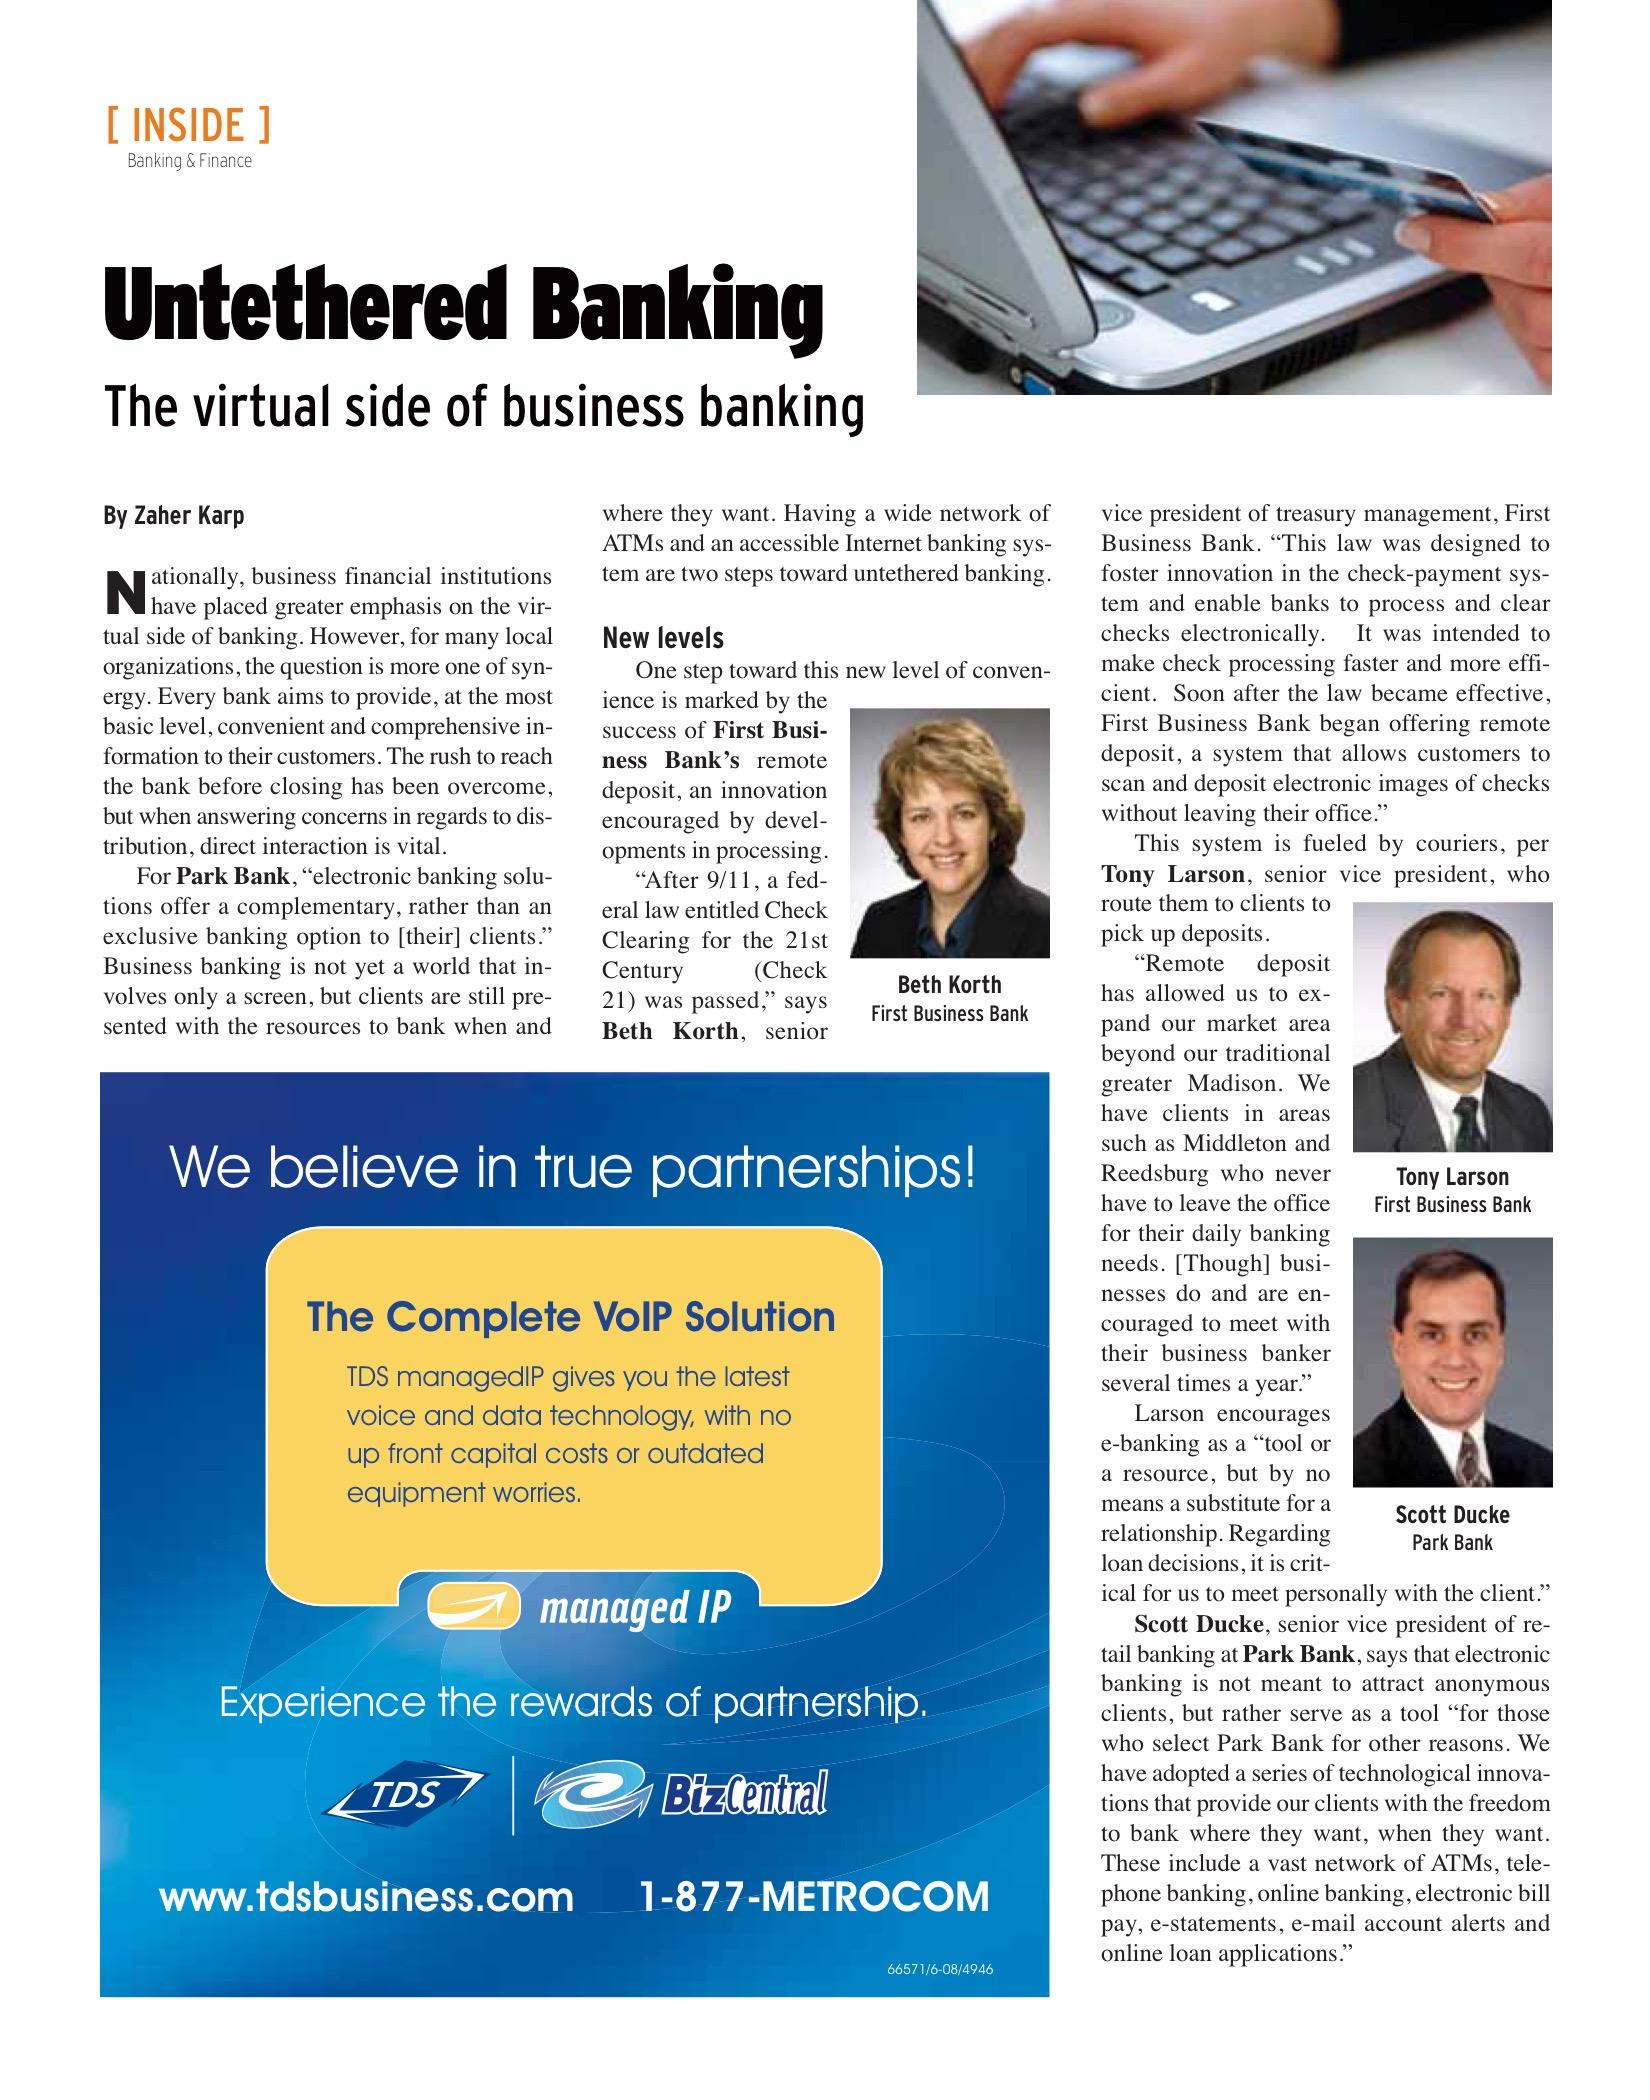 bankfeature 5.jpeg